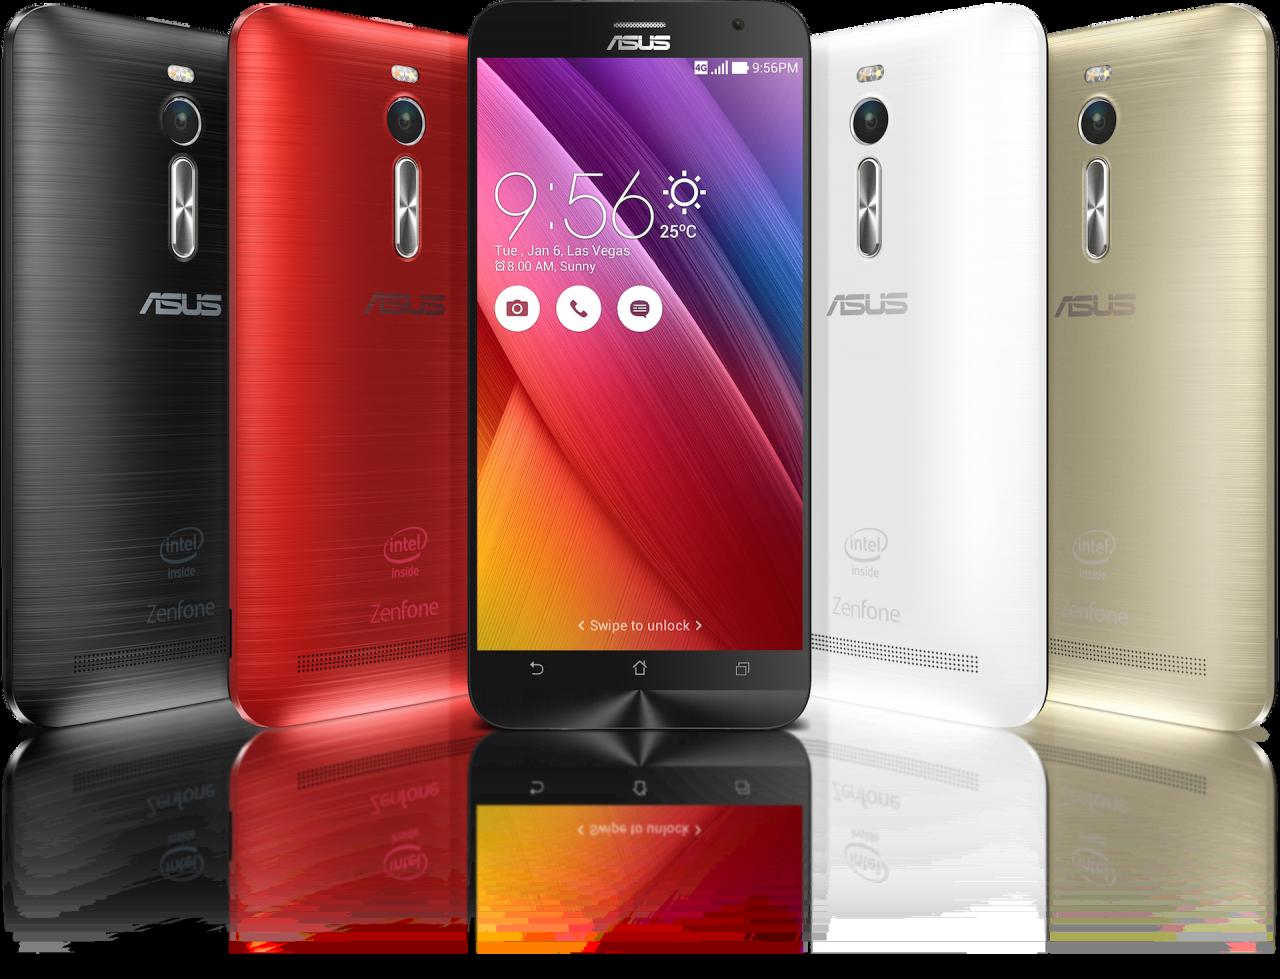 ASUS Zenfone 2 render ufficiali - 4